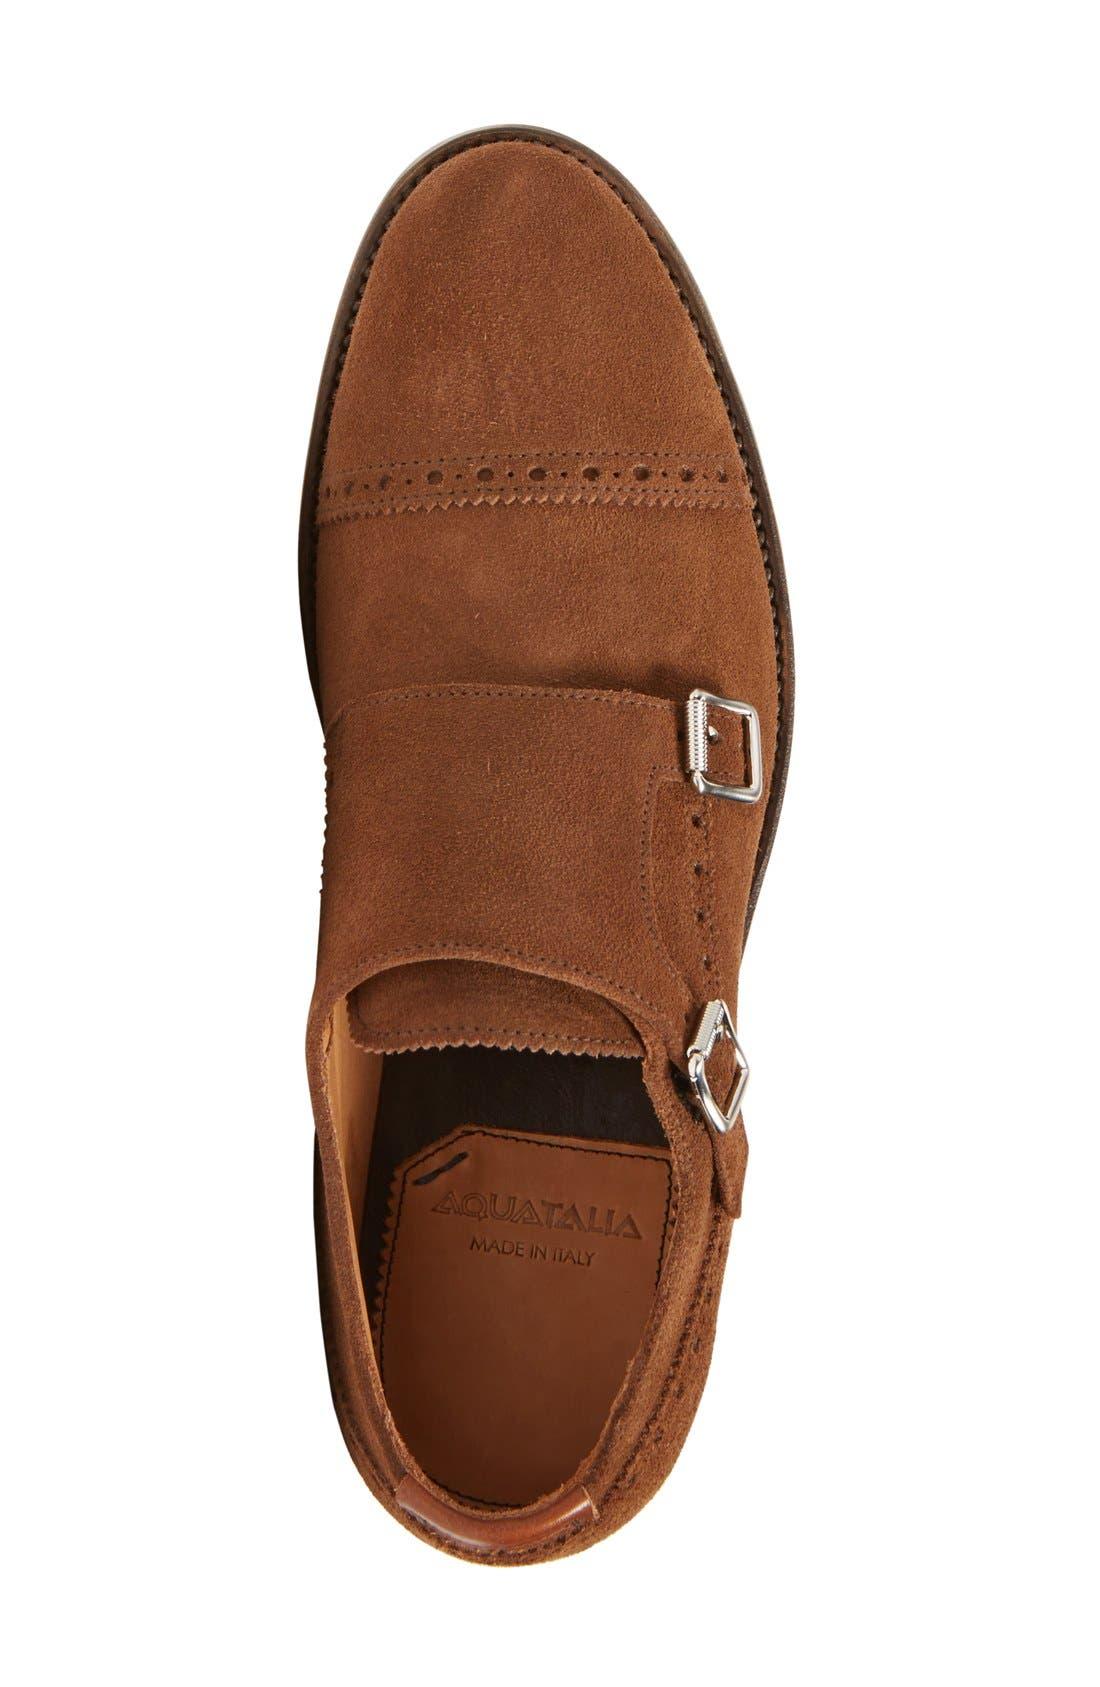 'Fallon' Weatherproof Monk Strap Shoe,                             Alternate thumbnail 9, color,